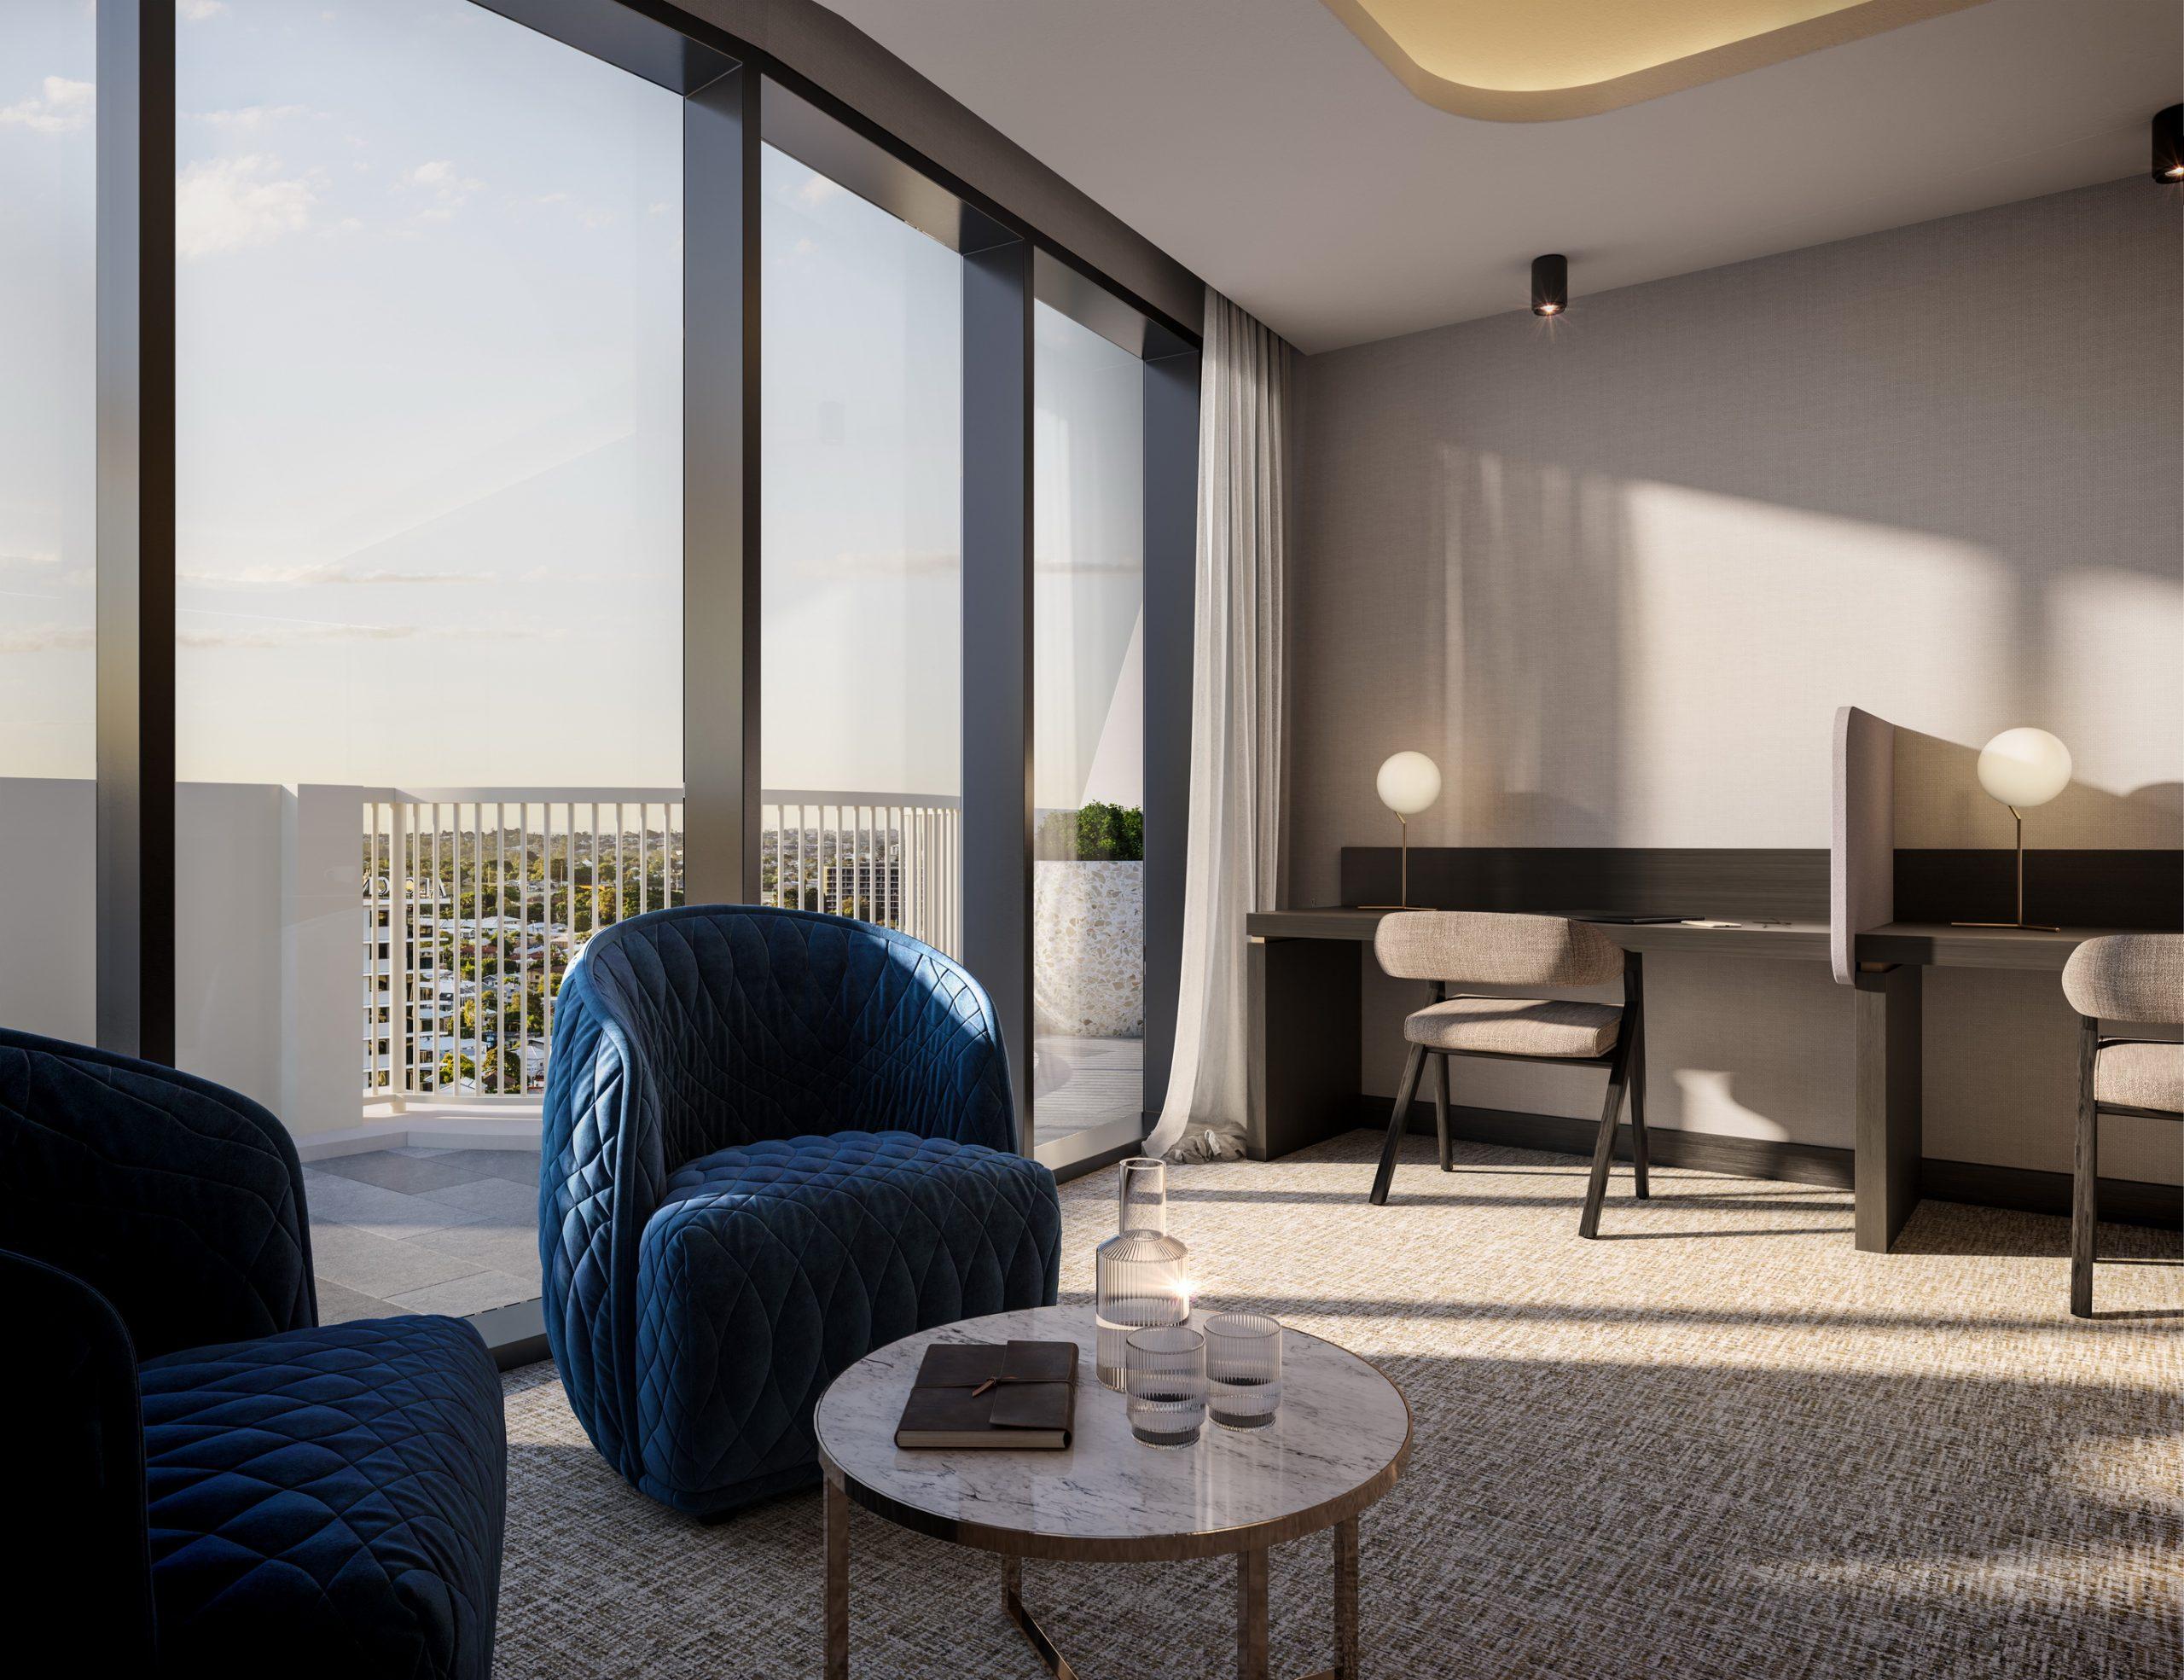 Rivello-queensland-render-3d-fkd-studio-architecture-luxury-co-work-space-interior